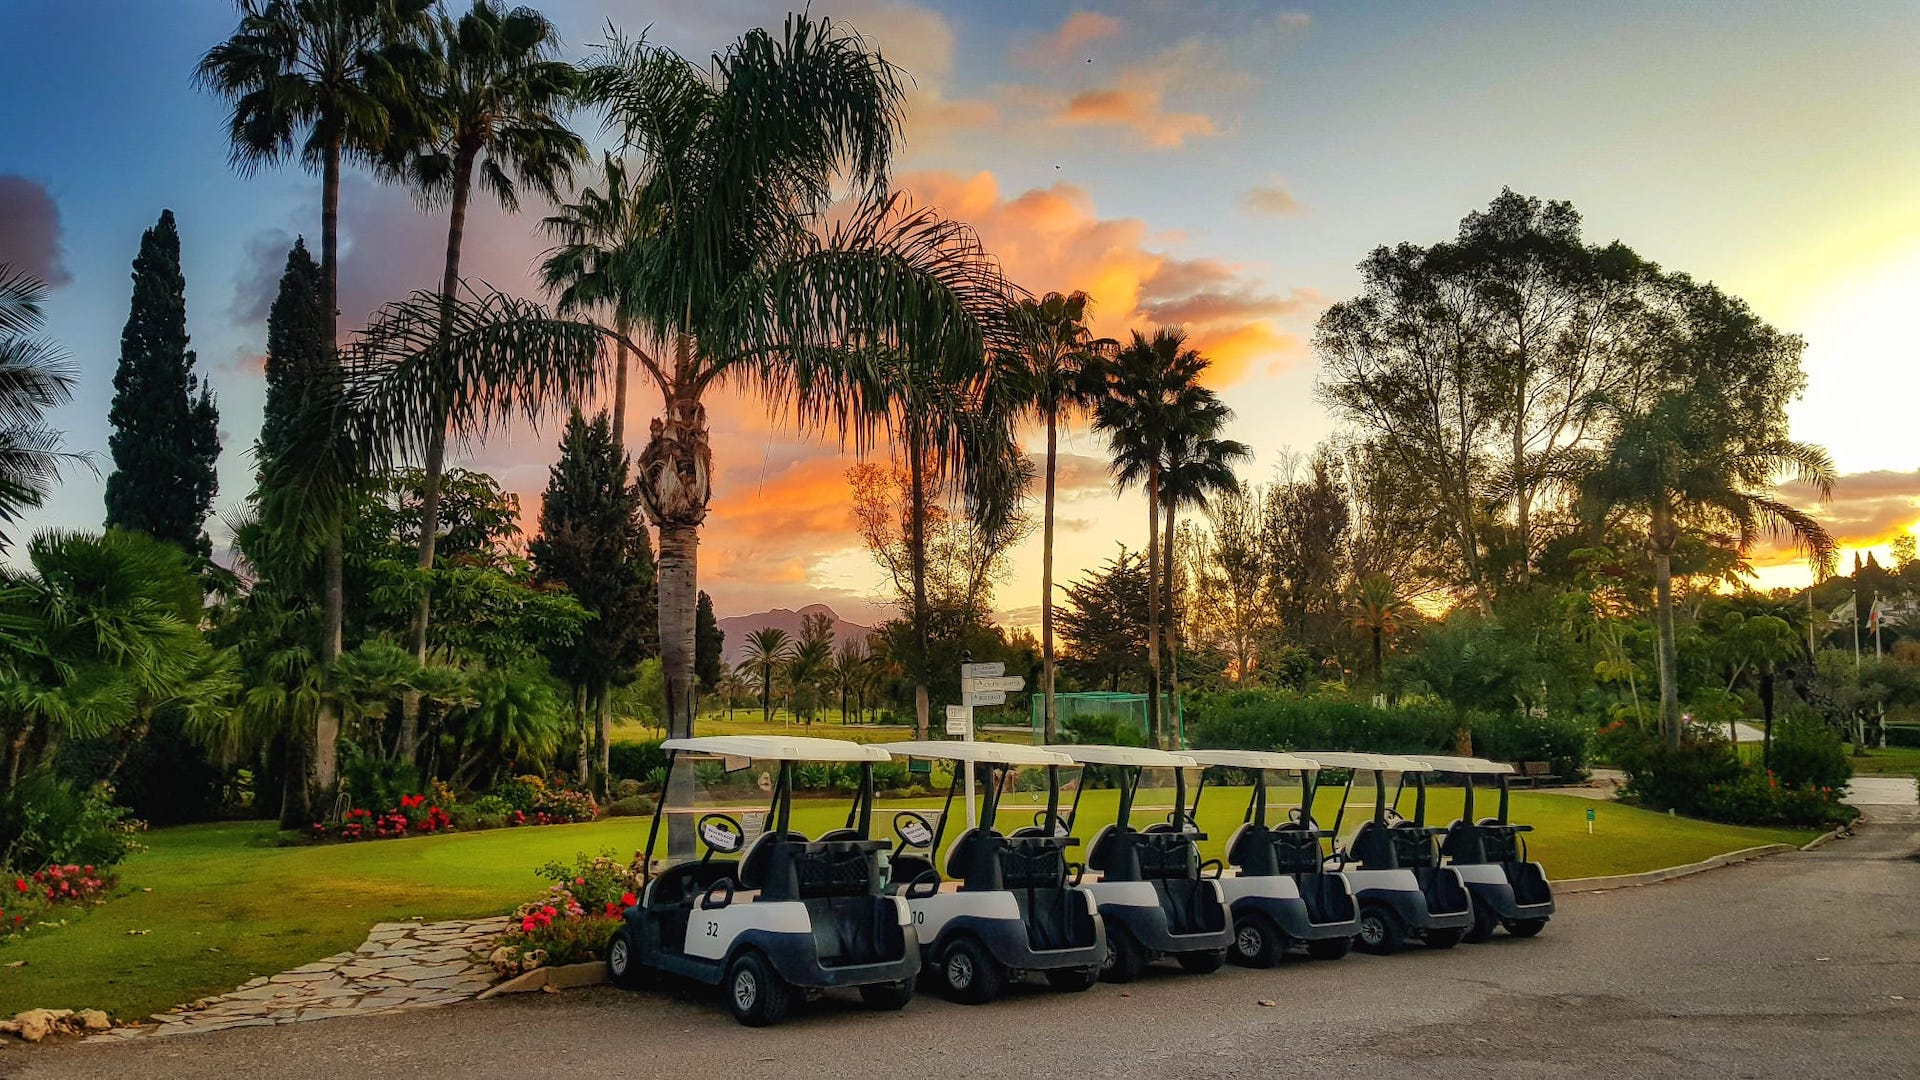 Club House - El Paraiso Golf - Estepona Malaga, Costa del Sol